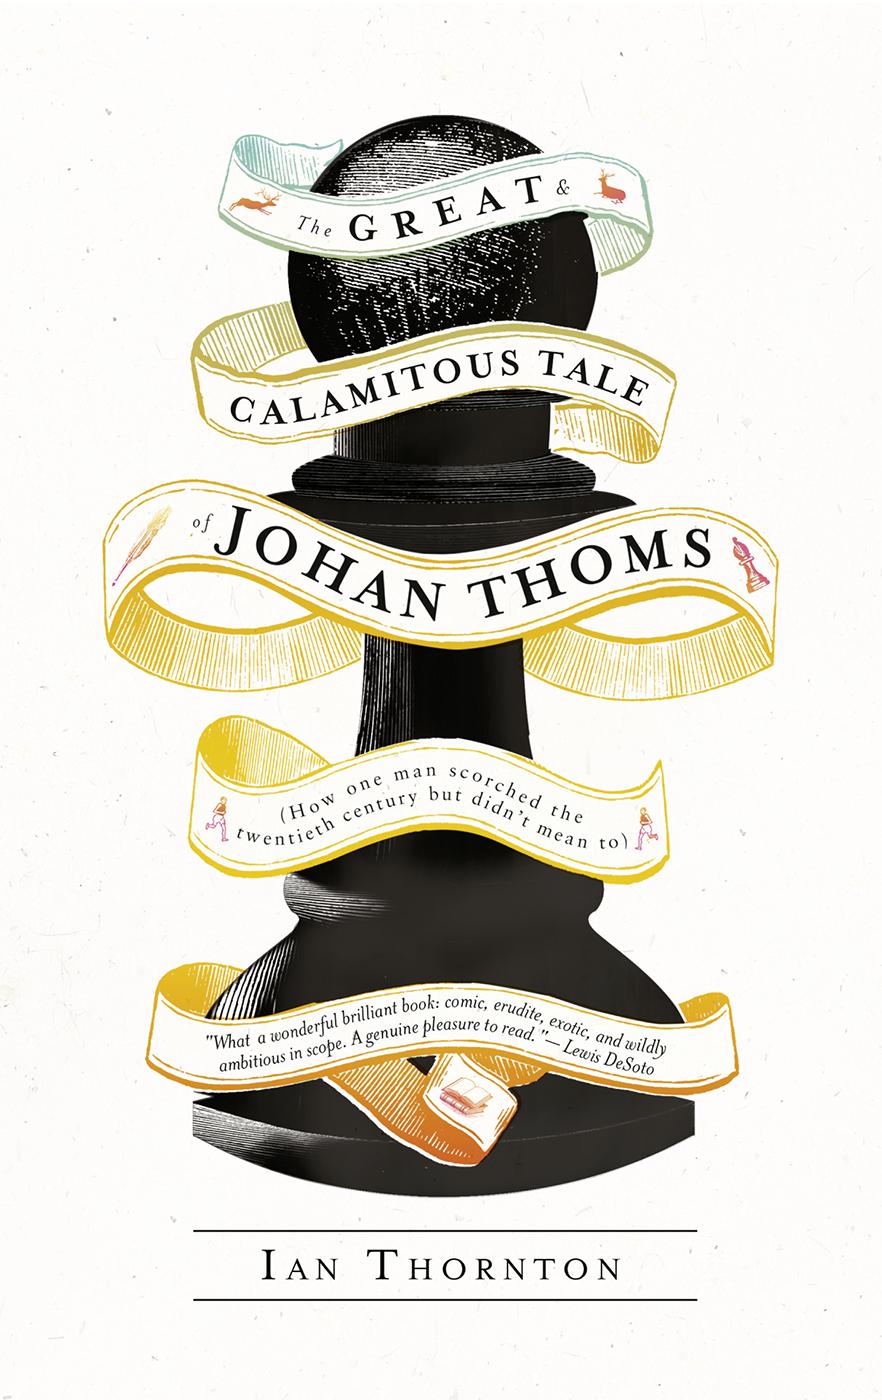 Ian Thornton The Great and Calamitous Tale of Johan Thoms ian gillan band ian gillan band live at the rainbow